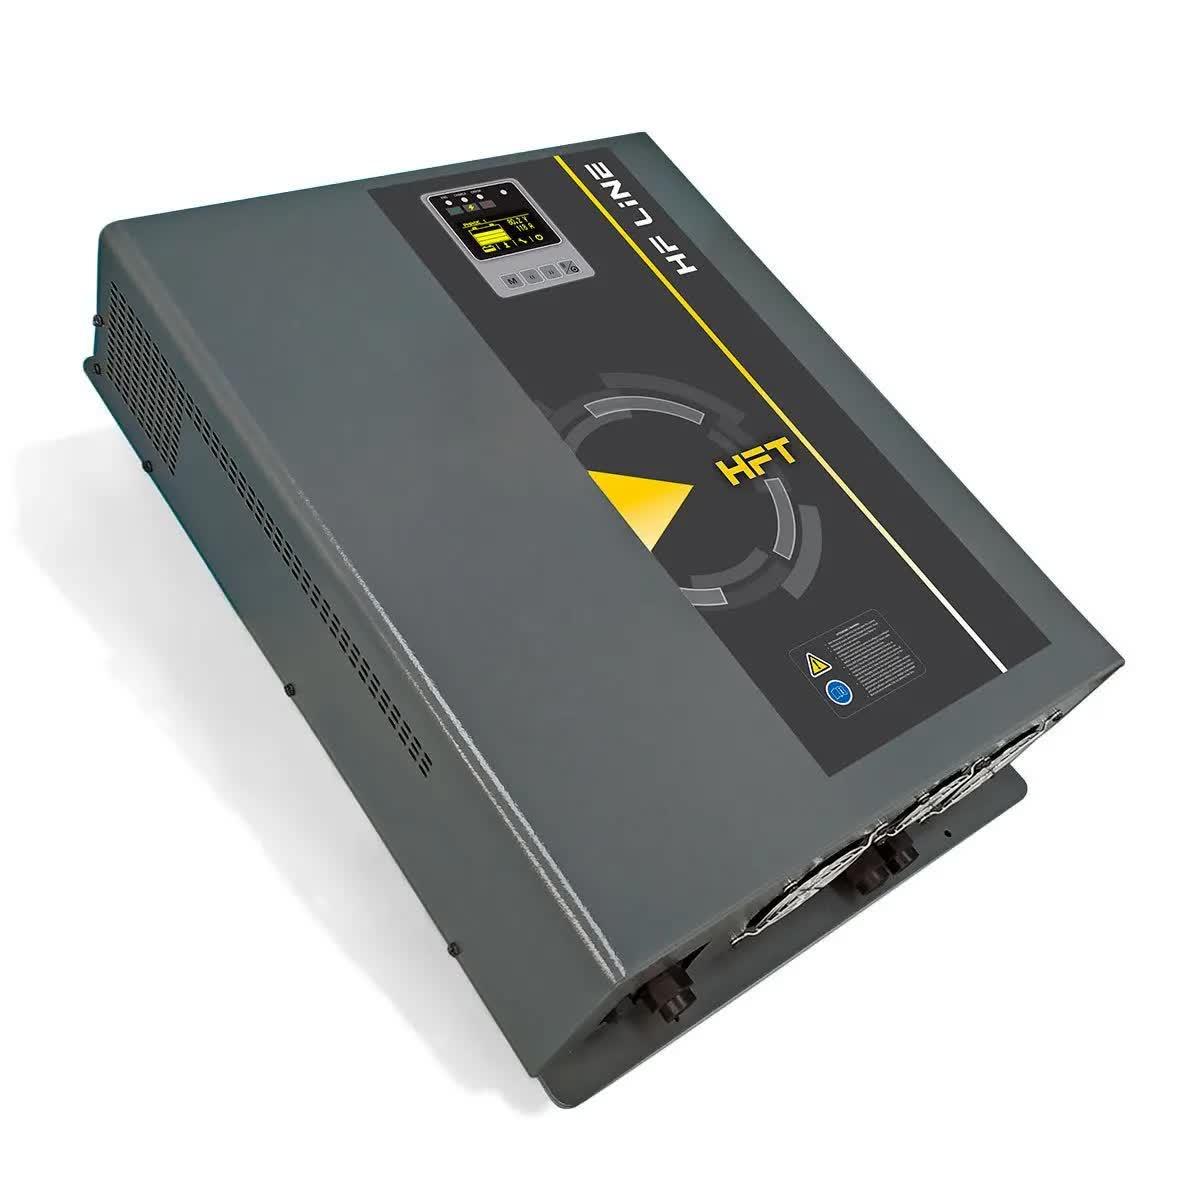 Chargeur pour Batteries au Lithium, Italy, ATIB Elettronica